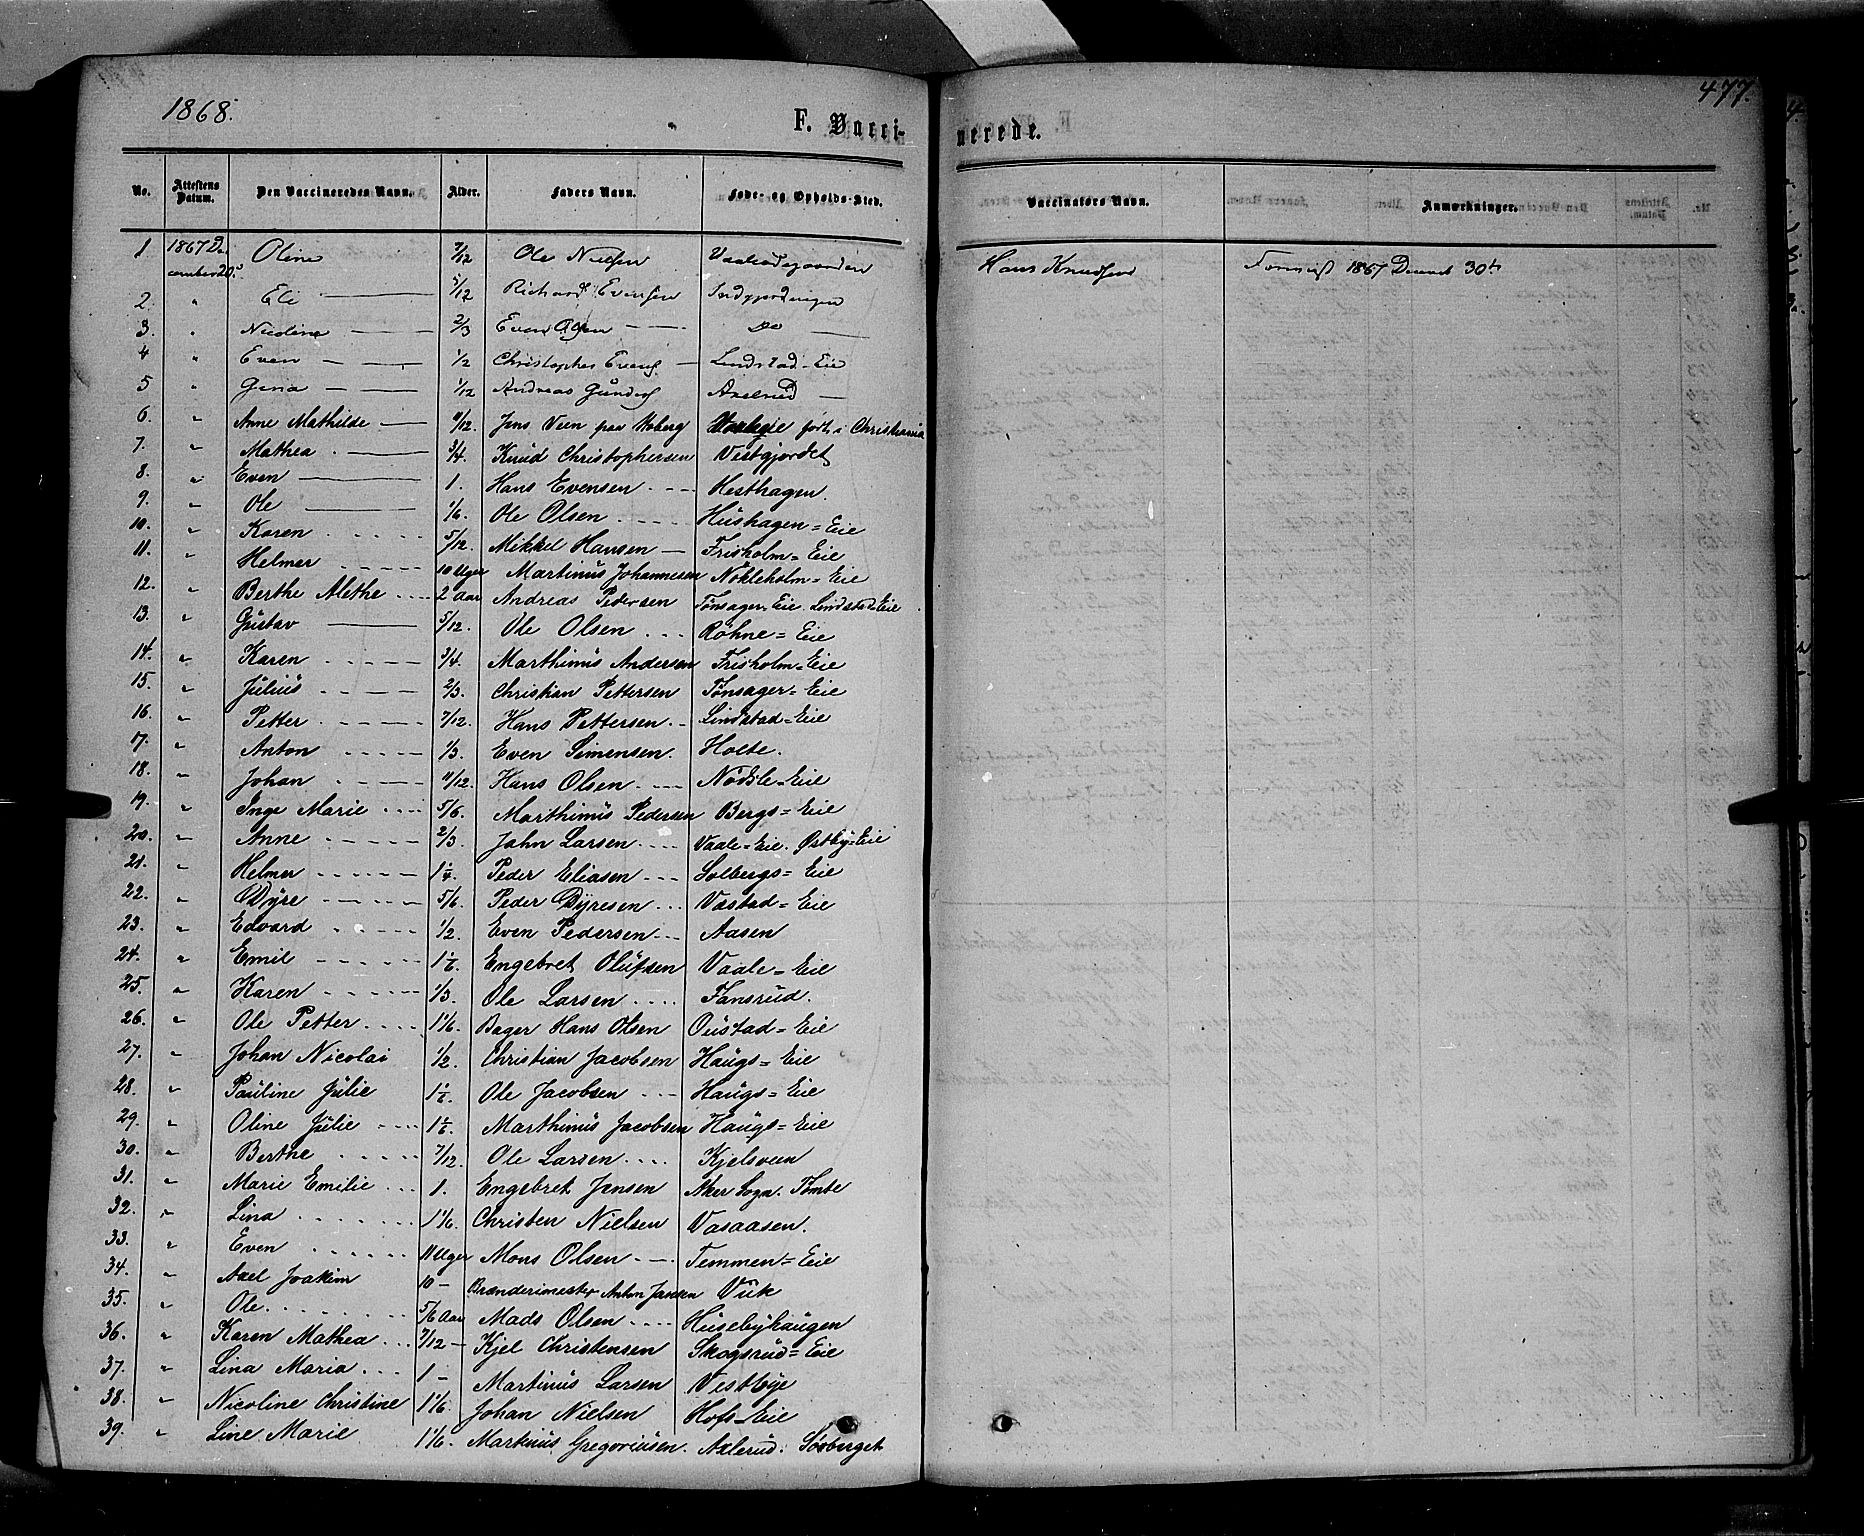 SAH, Stange prestekontor, K/L0013: Ministerialbok nr. 13, 1862-1879, s. 477